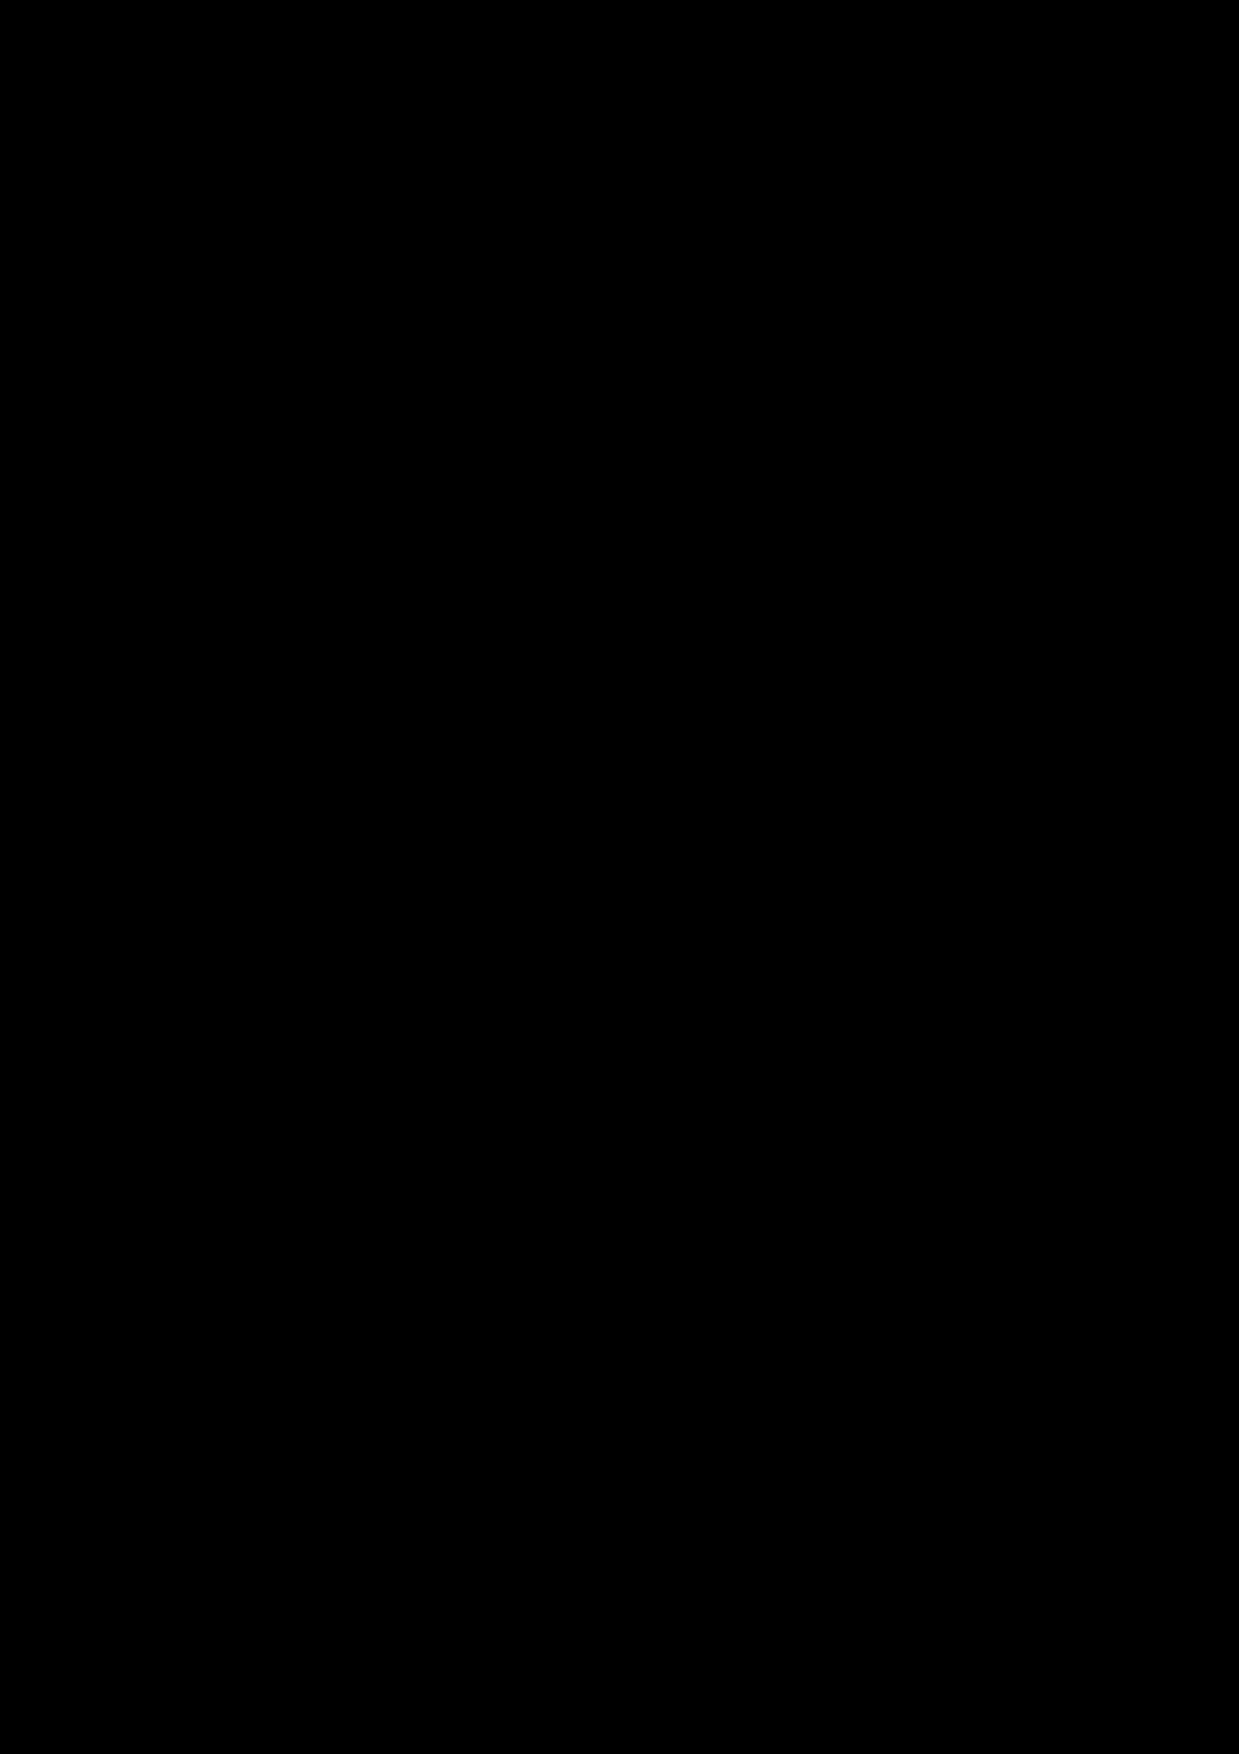 fundamentals of rural sociology and educational Sociology preparation strategy chandra mohan garg, rank 25 cse vikash ranjan book ( fundamentals of sociology): available in book stores haralambos(small one) applied sociology (a) programmes of rural development.